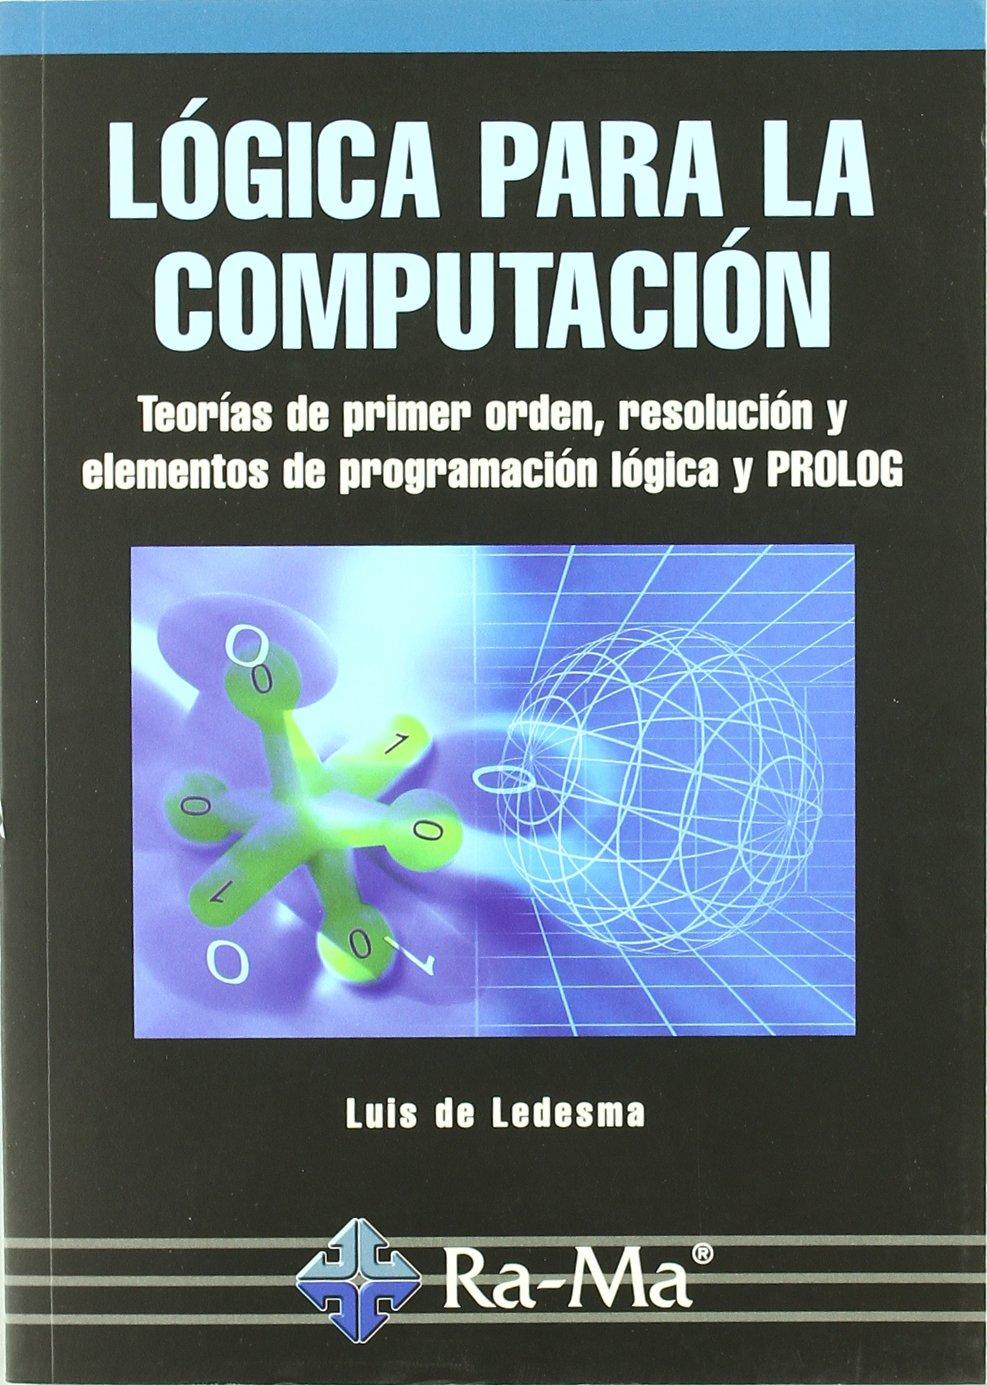 Logica para la computacion ebook